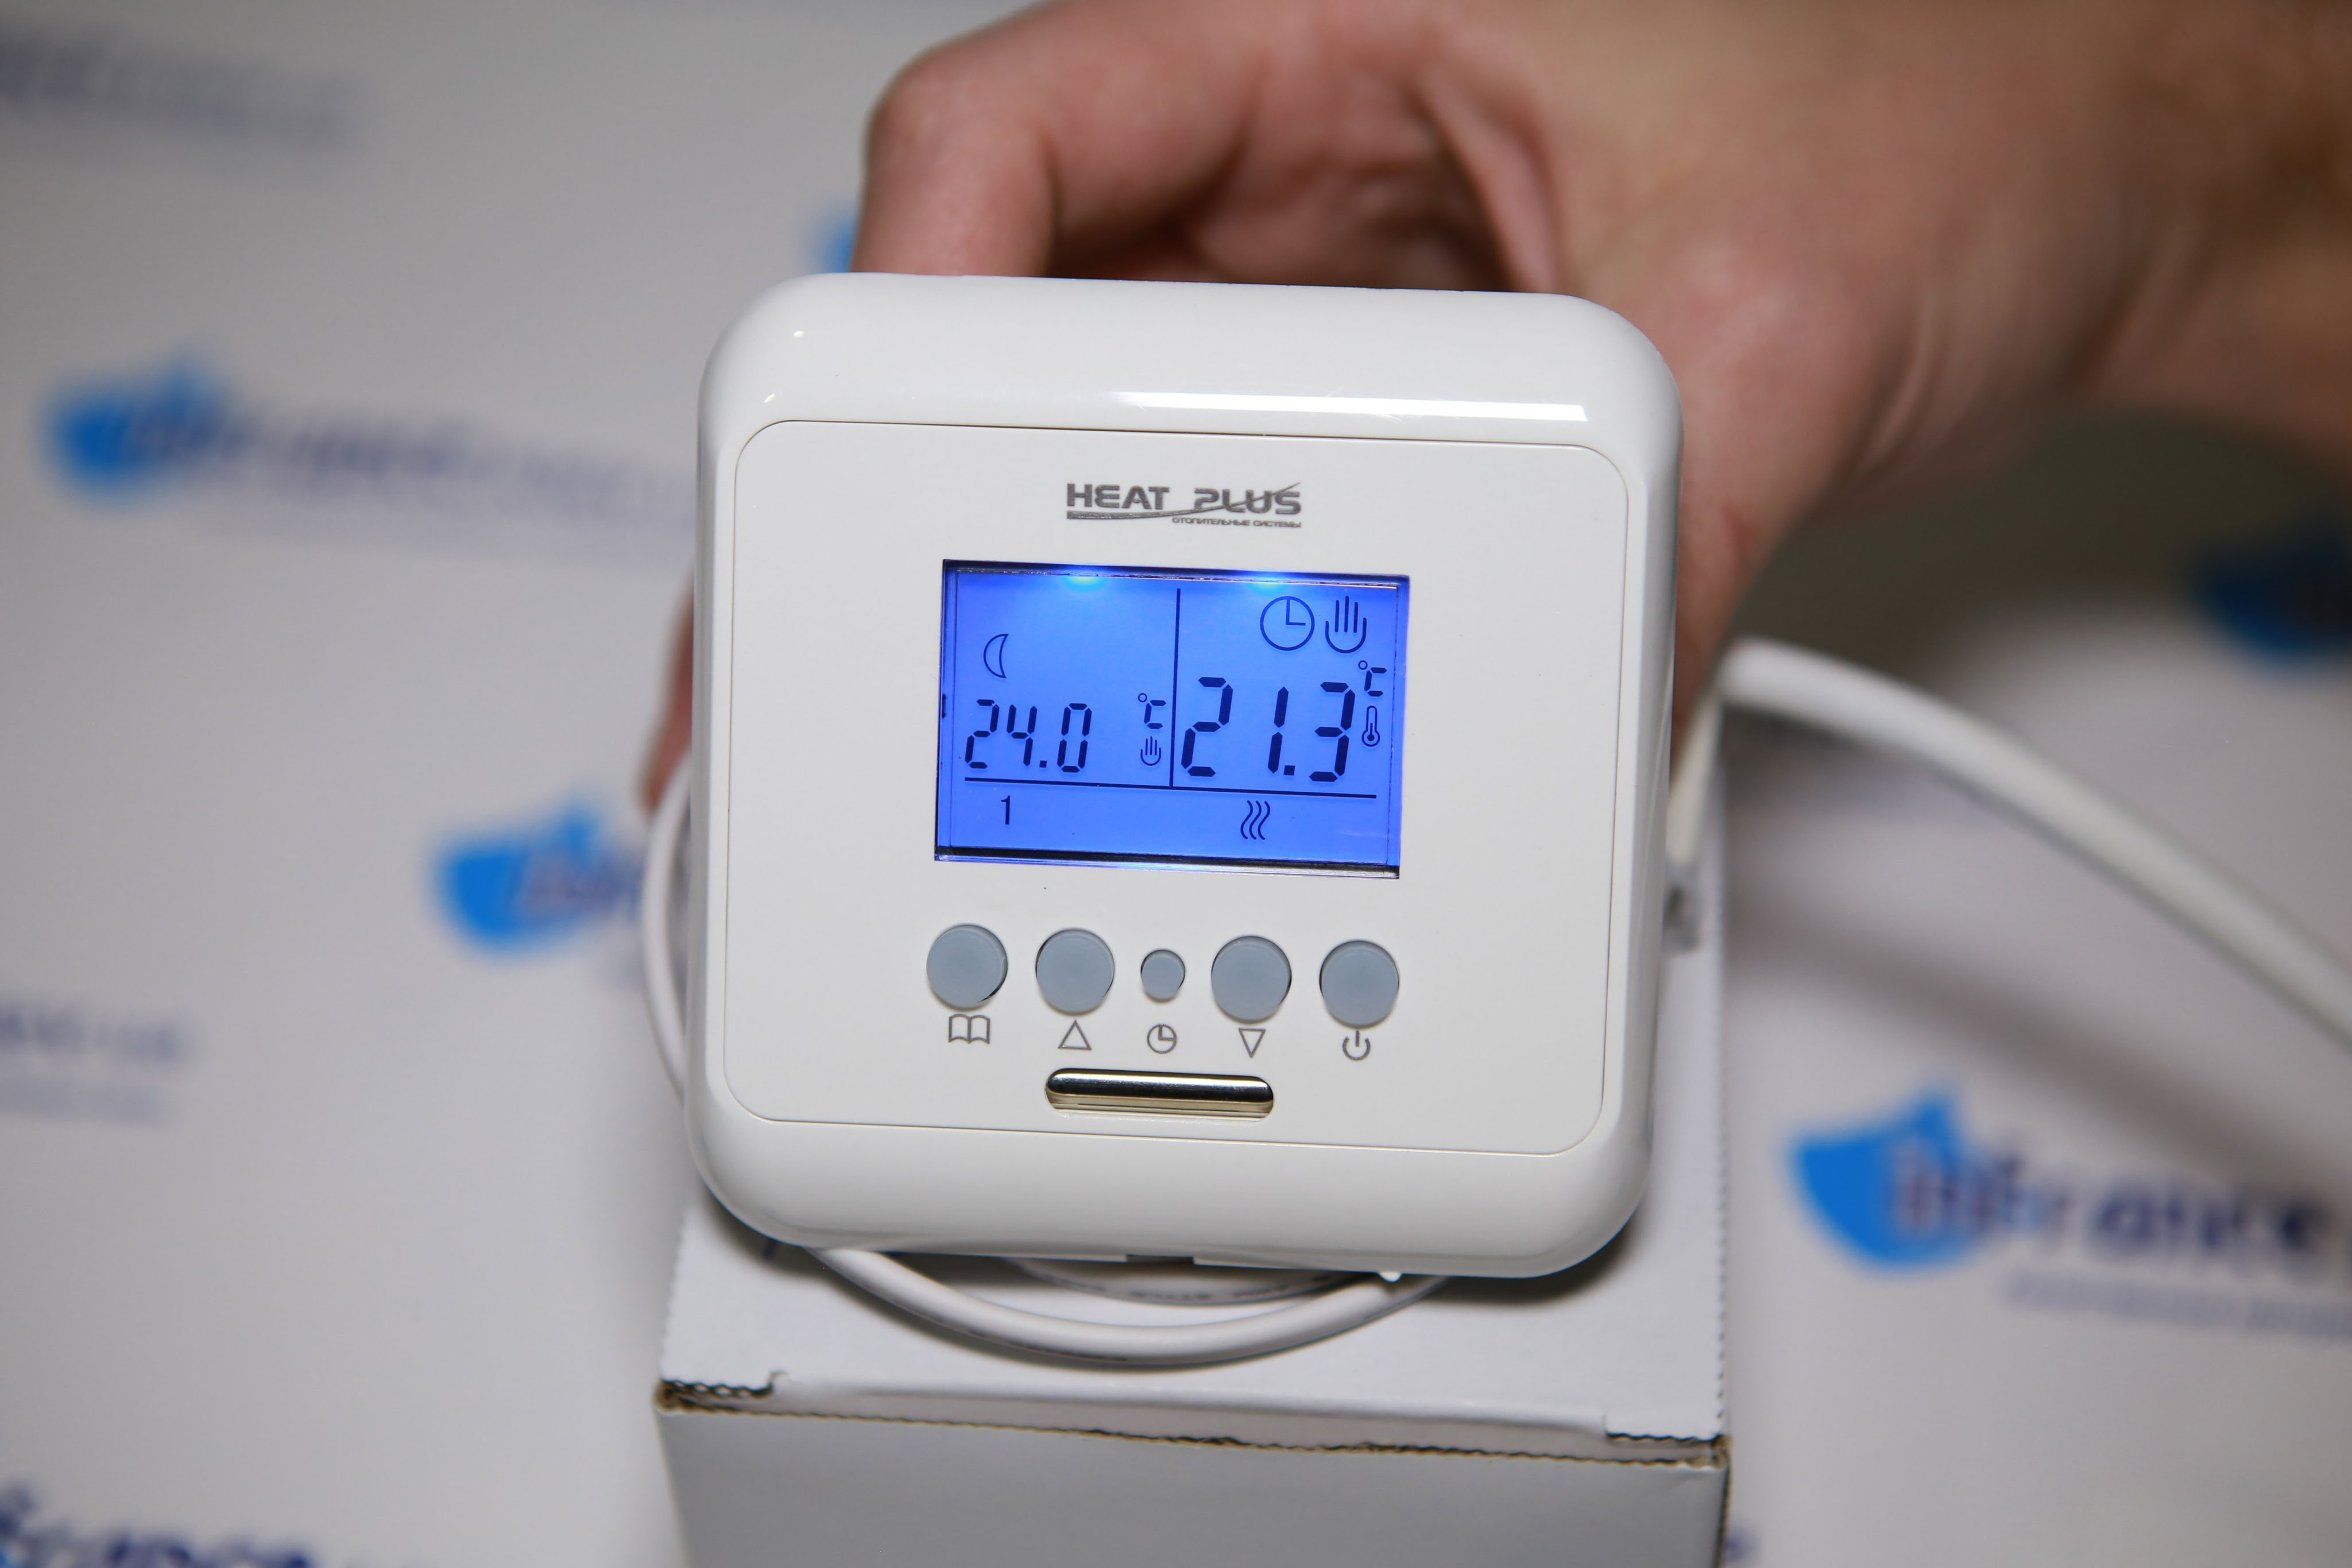 Подключение терморегулятора для теплого пола